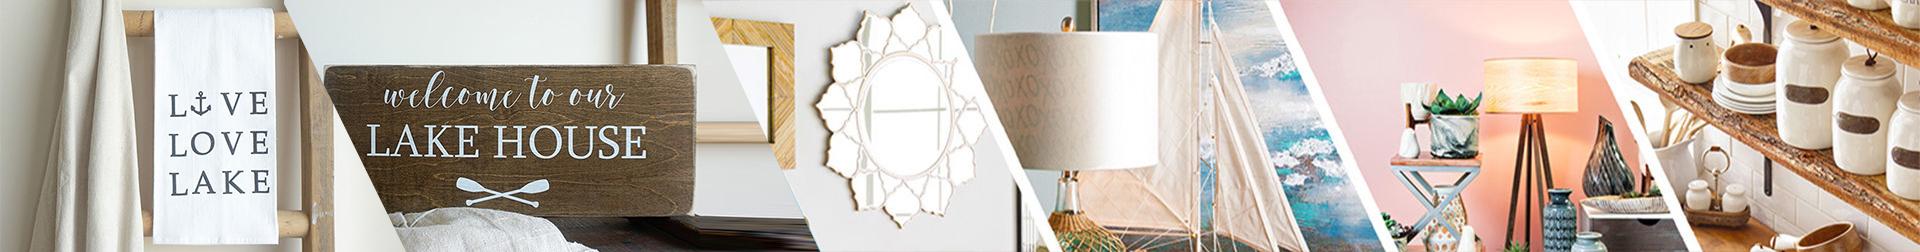 Lake Life - Cotton Tea Towel at Best Price | Wooden Signs | AromaCraze.com